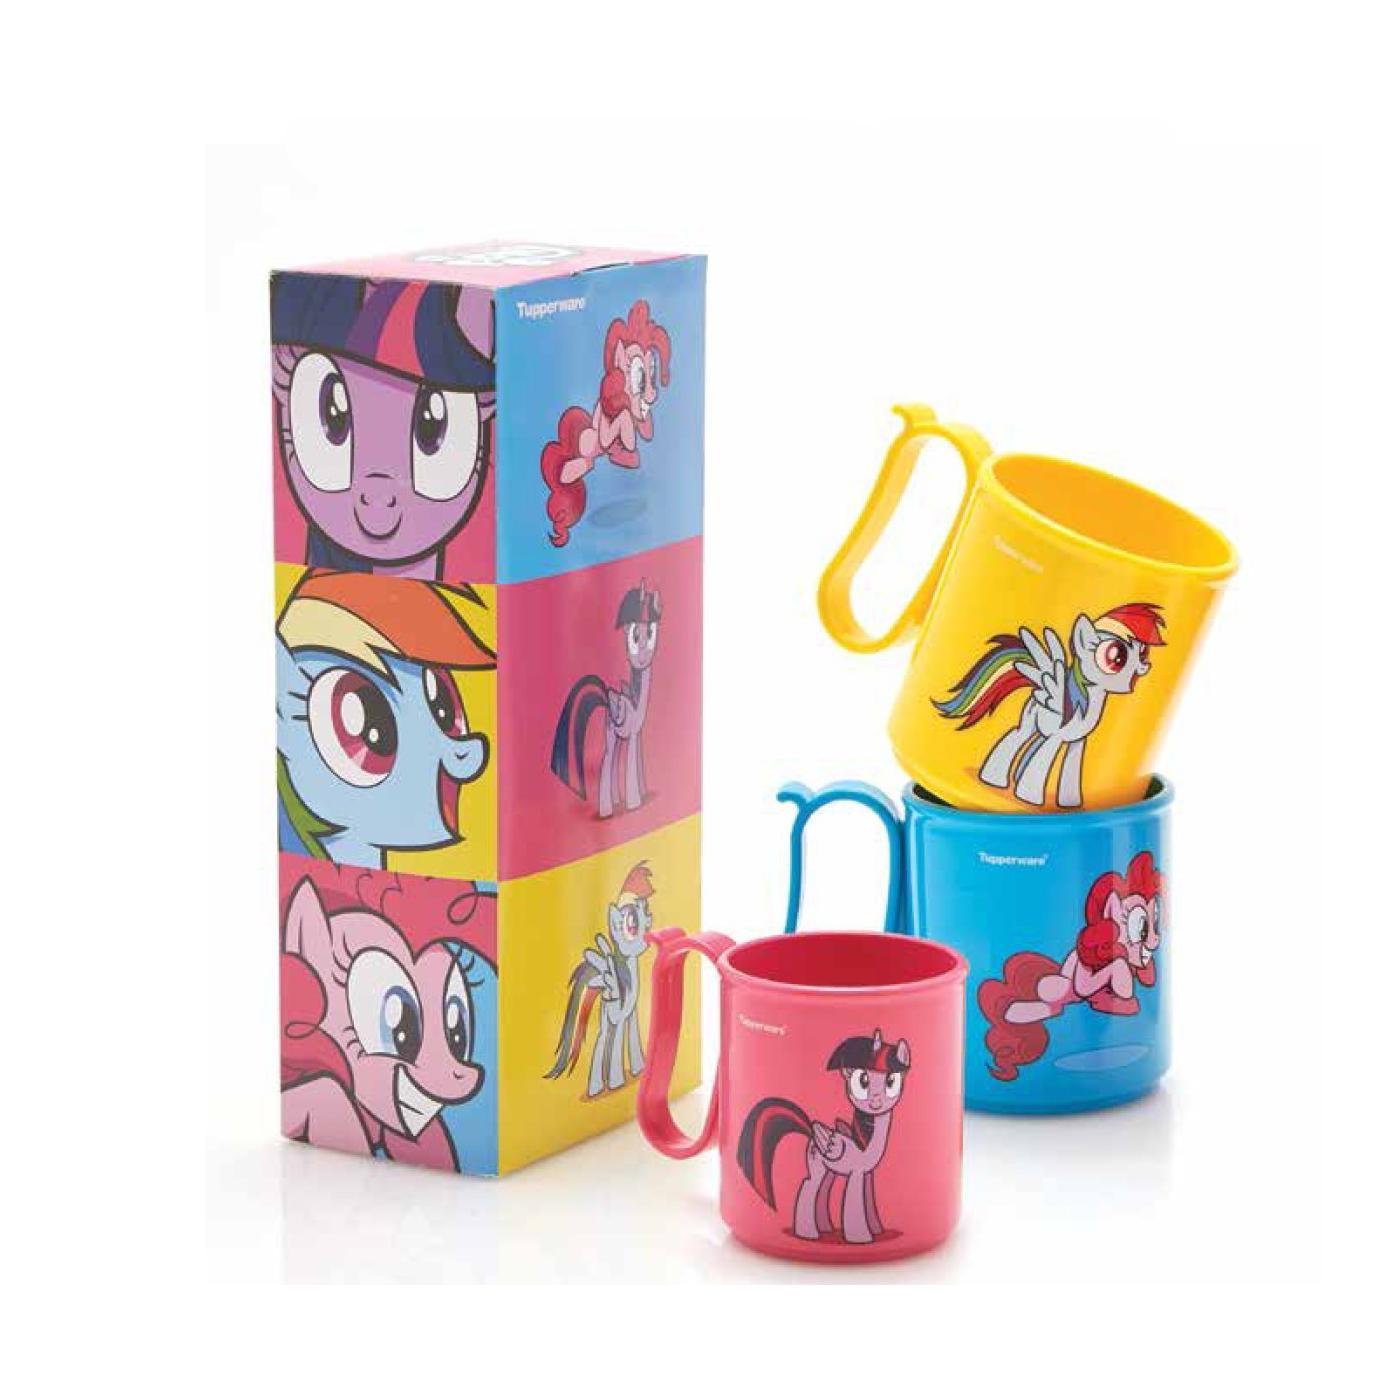 Cek Harga Baru Radhe Mug Kaca Polos Dengan Tutup 450ml 3pcs Terkini Harpic Stain Blaster Citrus Tupperware My Little Pony